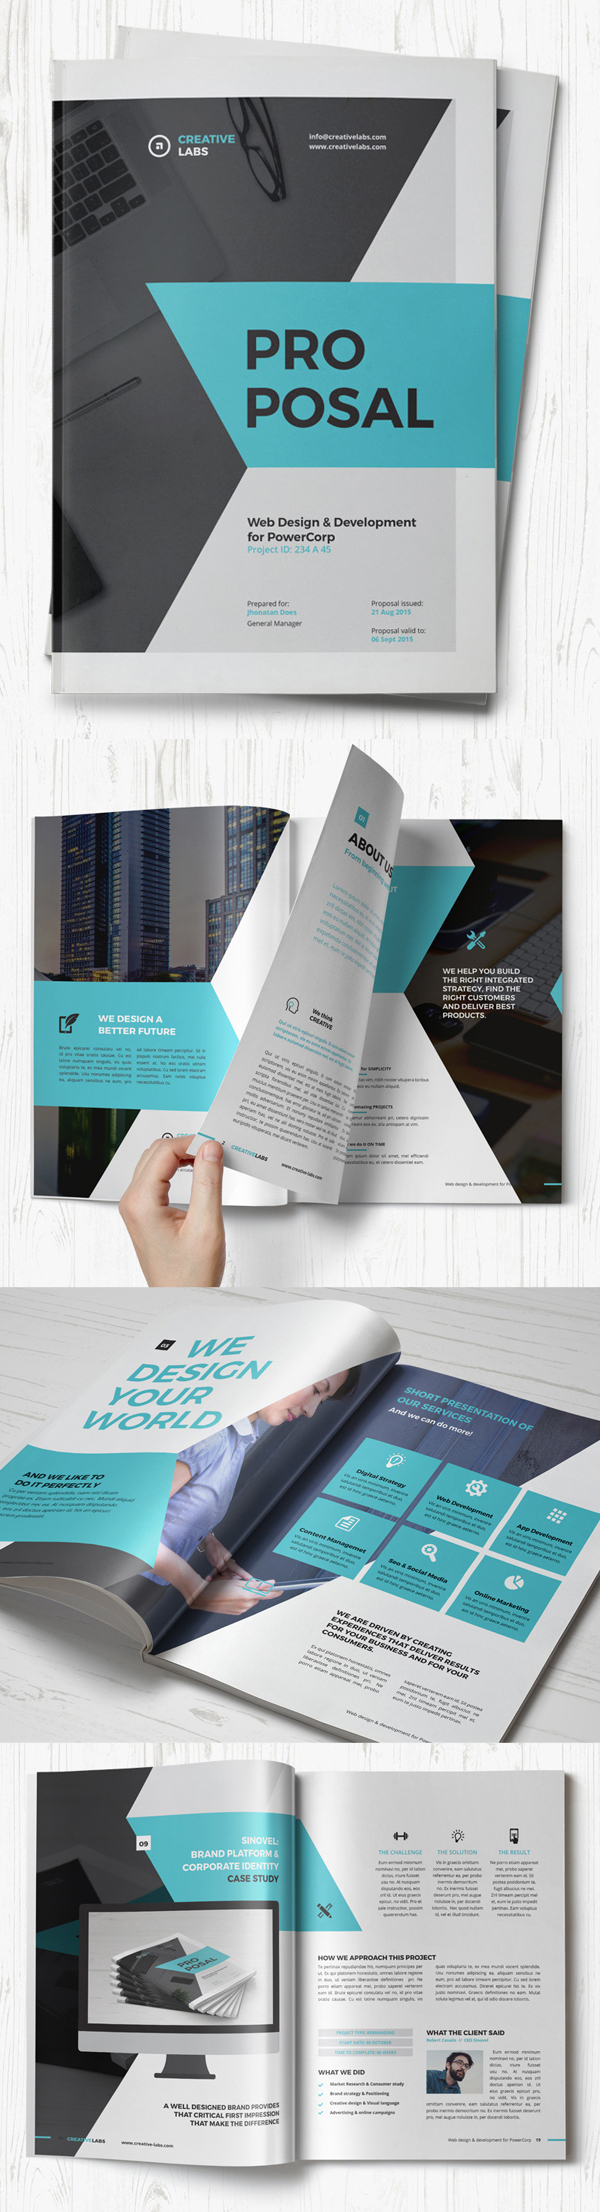 100 Professional Corporate Brochure Templates - 7